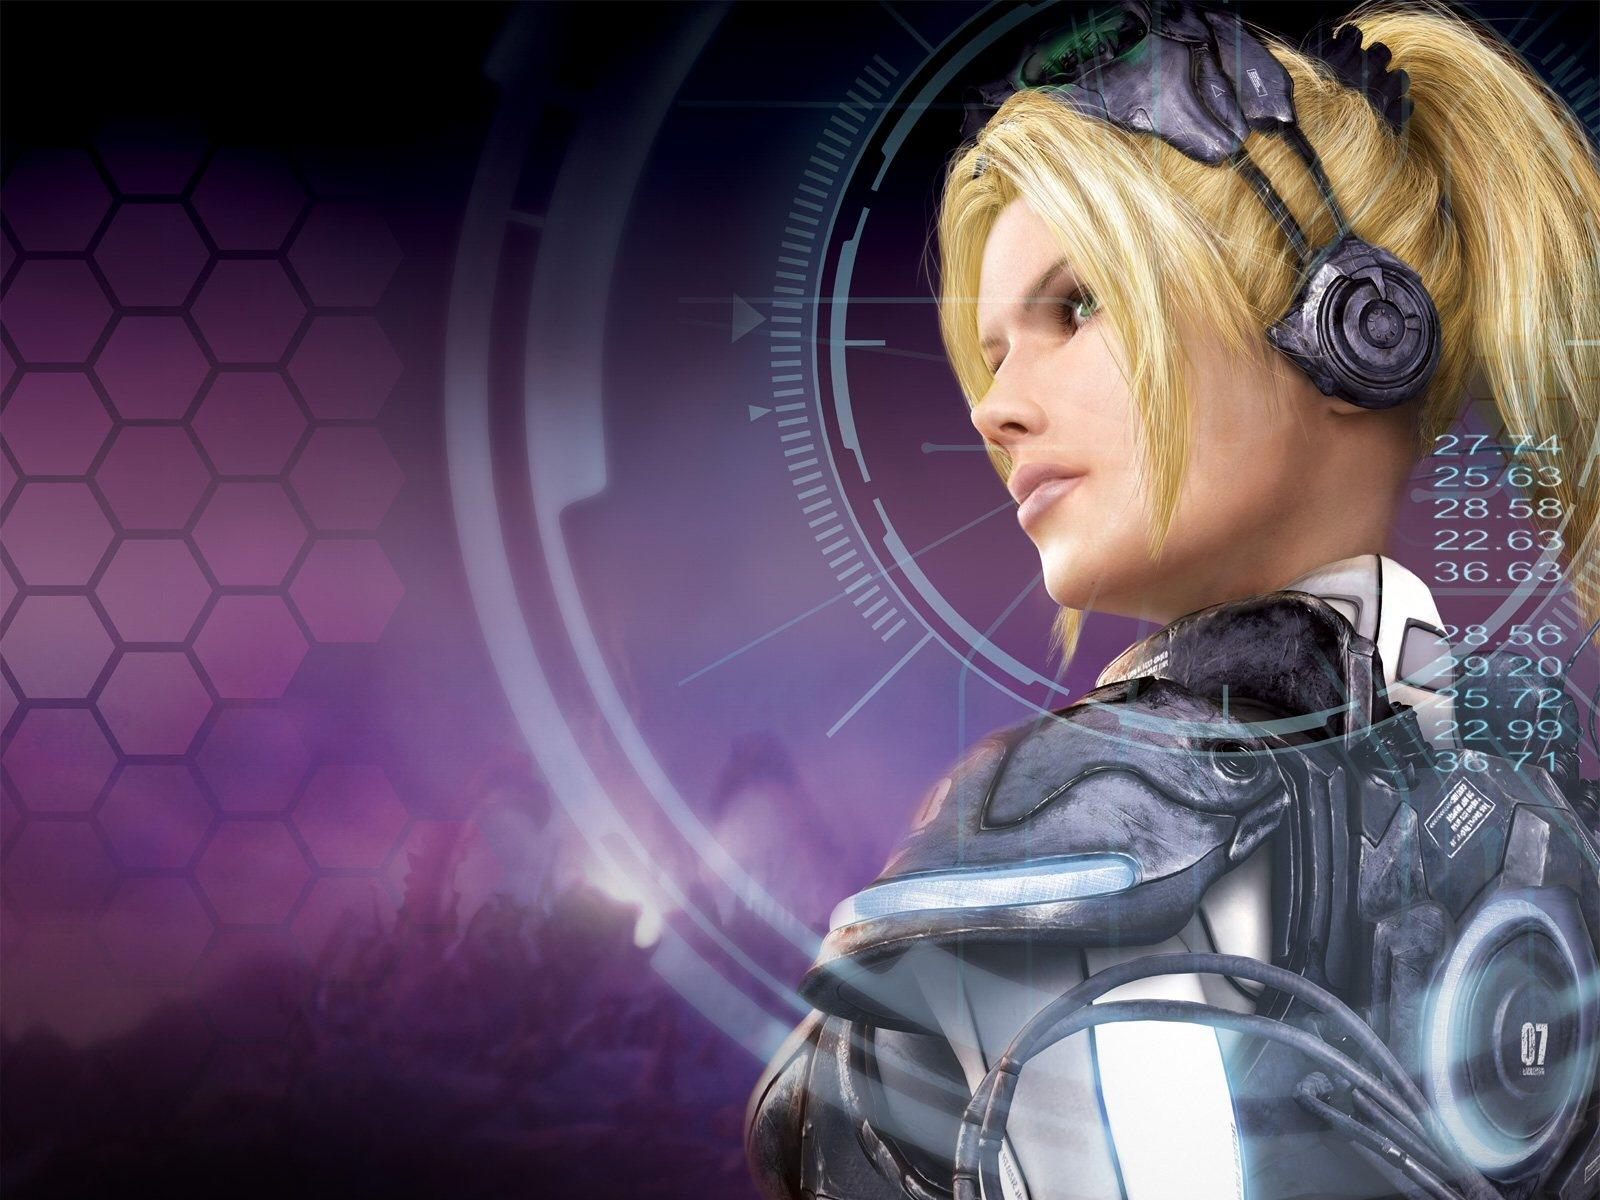 Nova StarCraft Ghost Pictures Wallpapers CG Art Photos 1600x1200